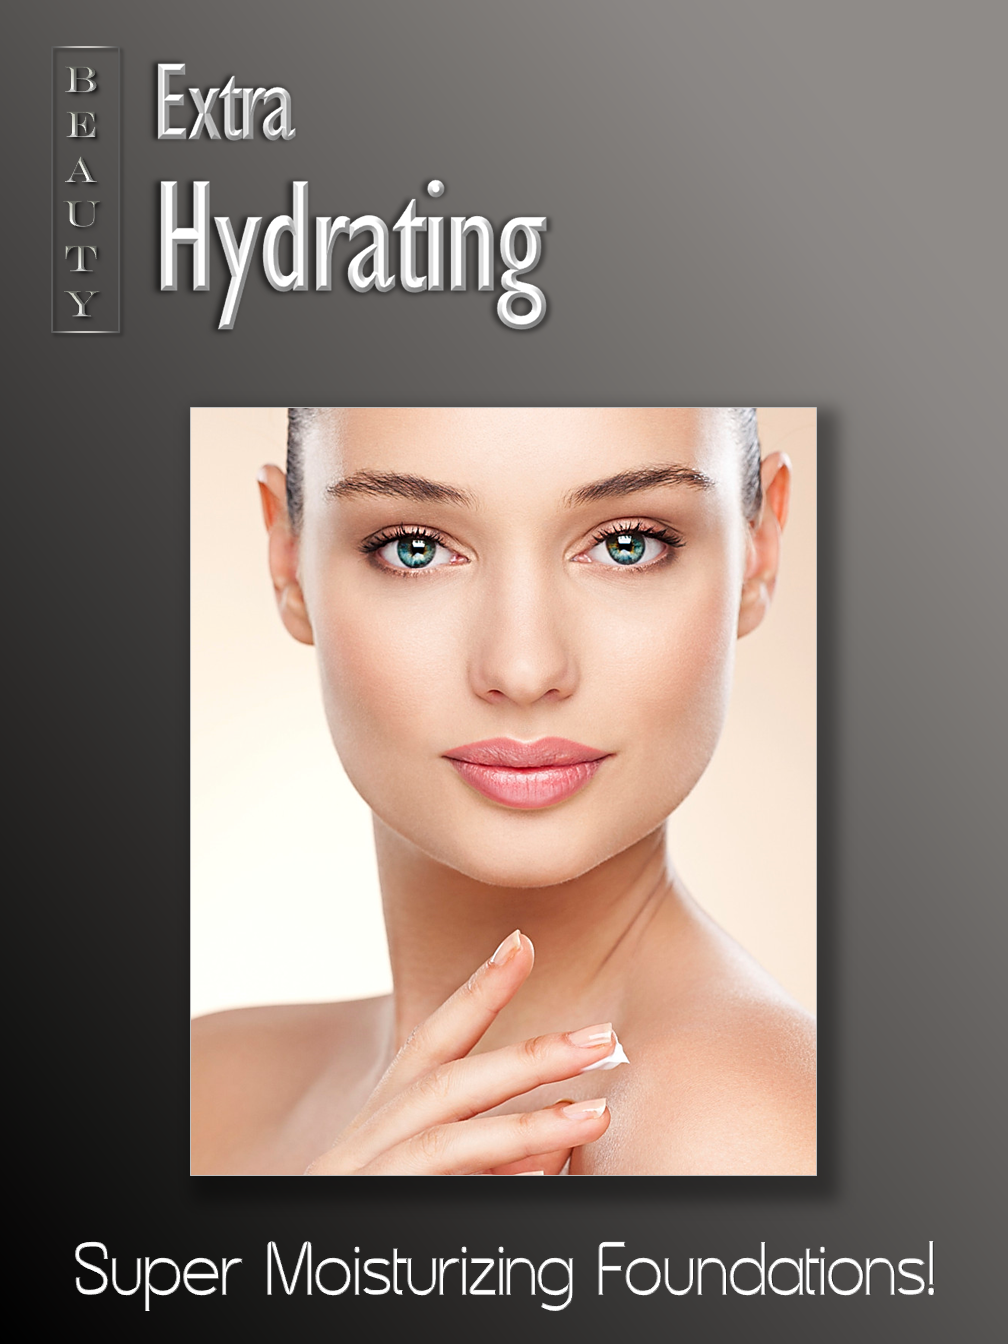 Extra Hydrating